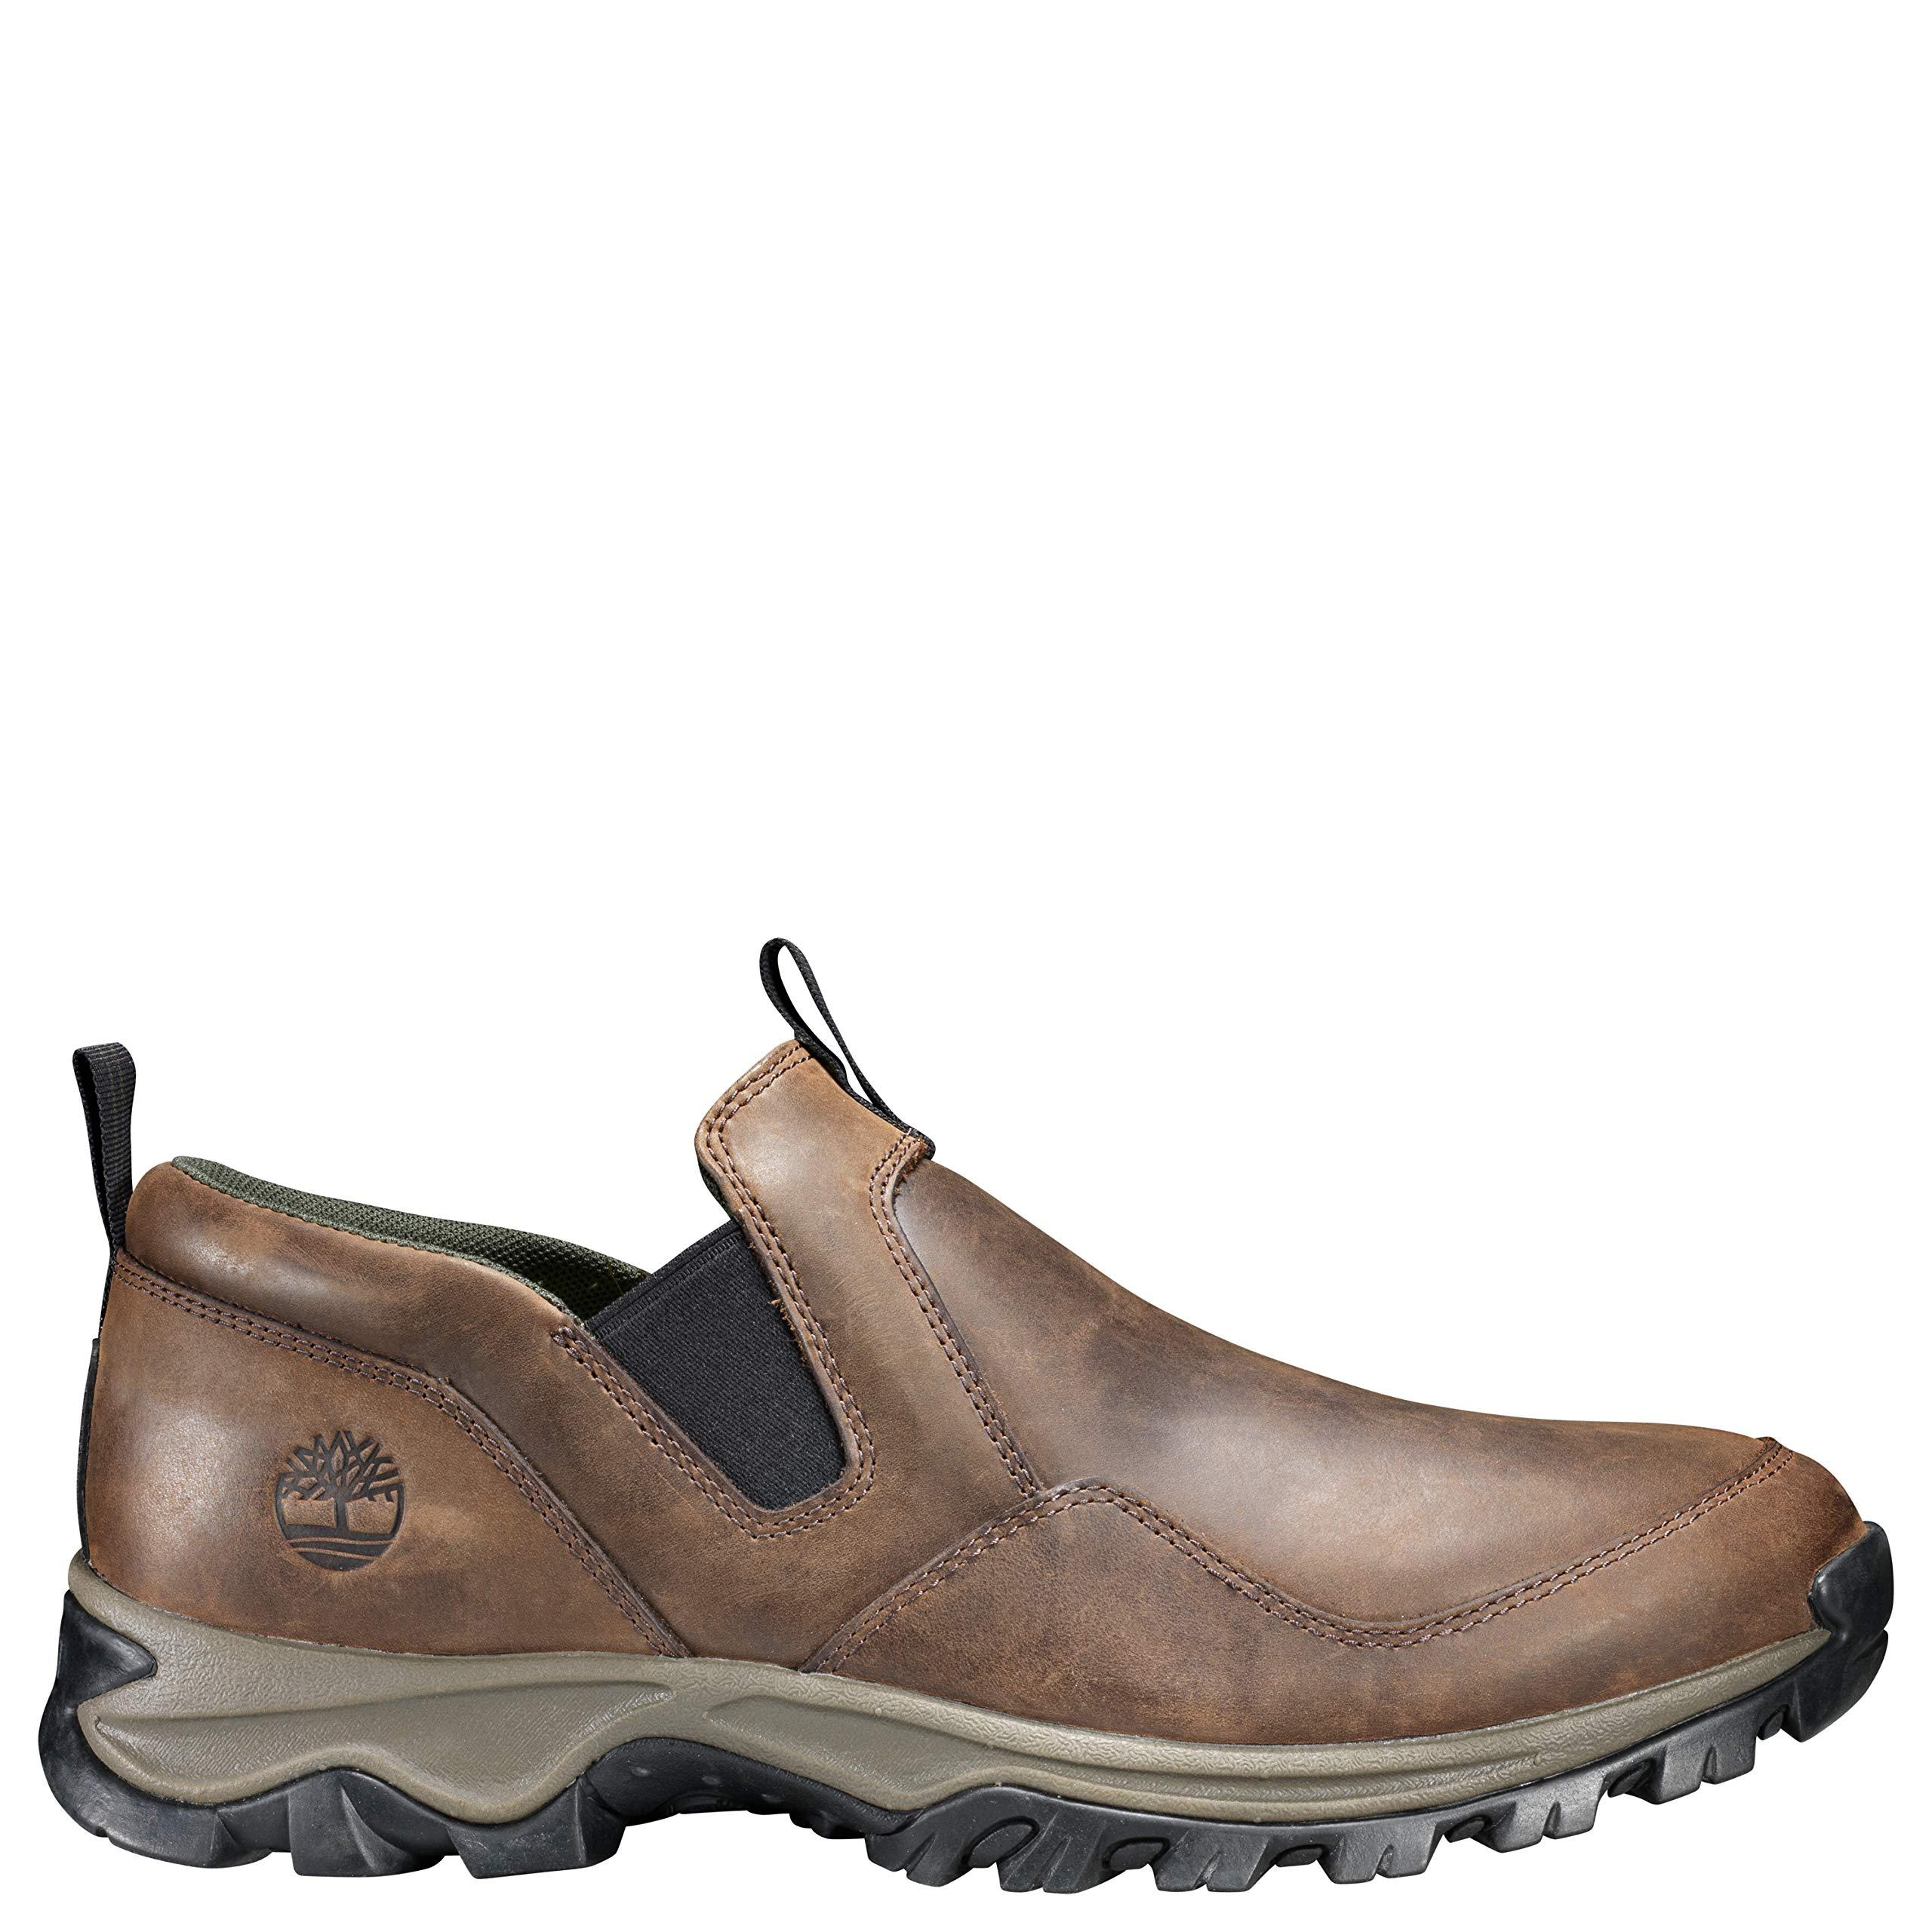 Timberland Men's Mt. Maddsen Slip On Hiking Shoe, Dark Brown, 10 Medium US